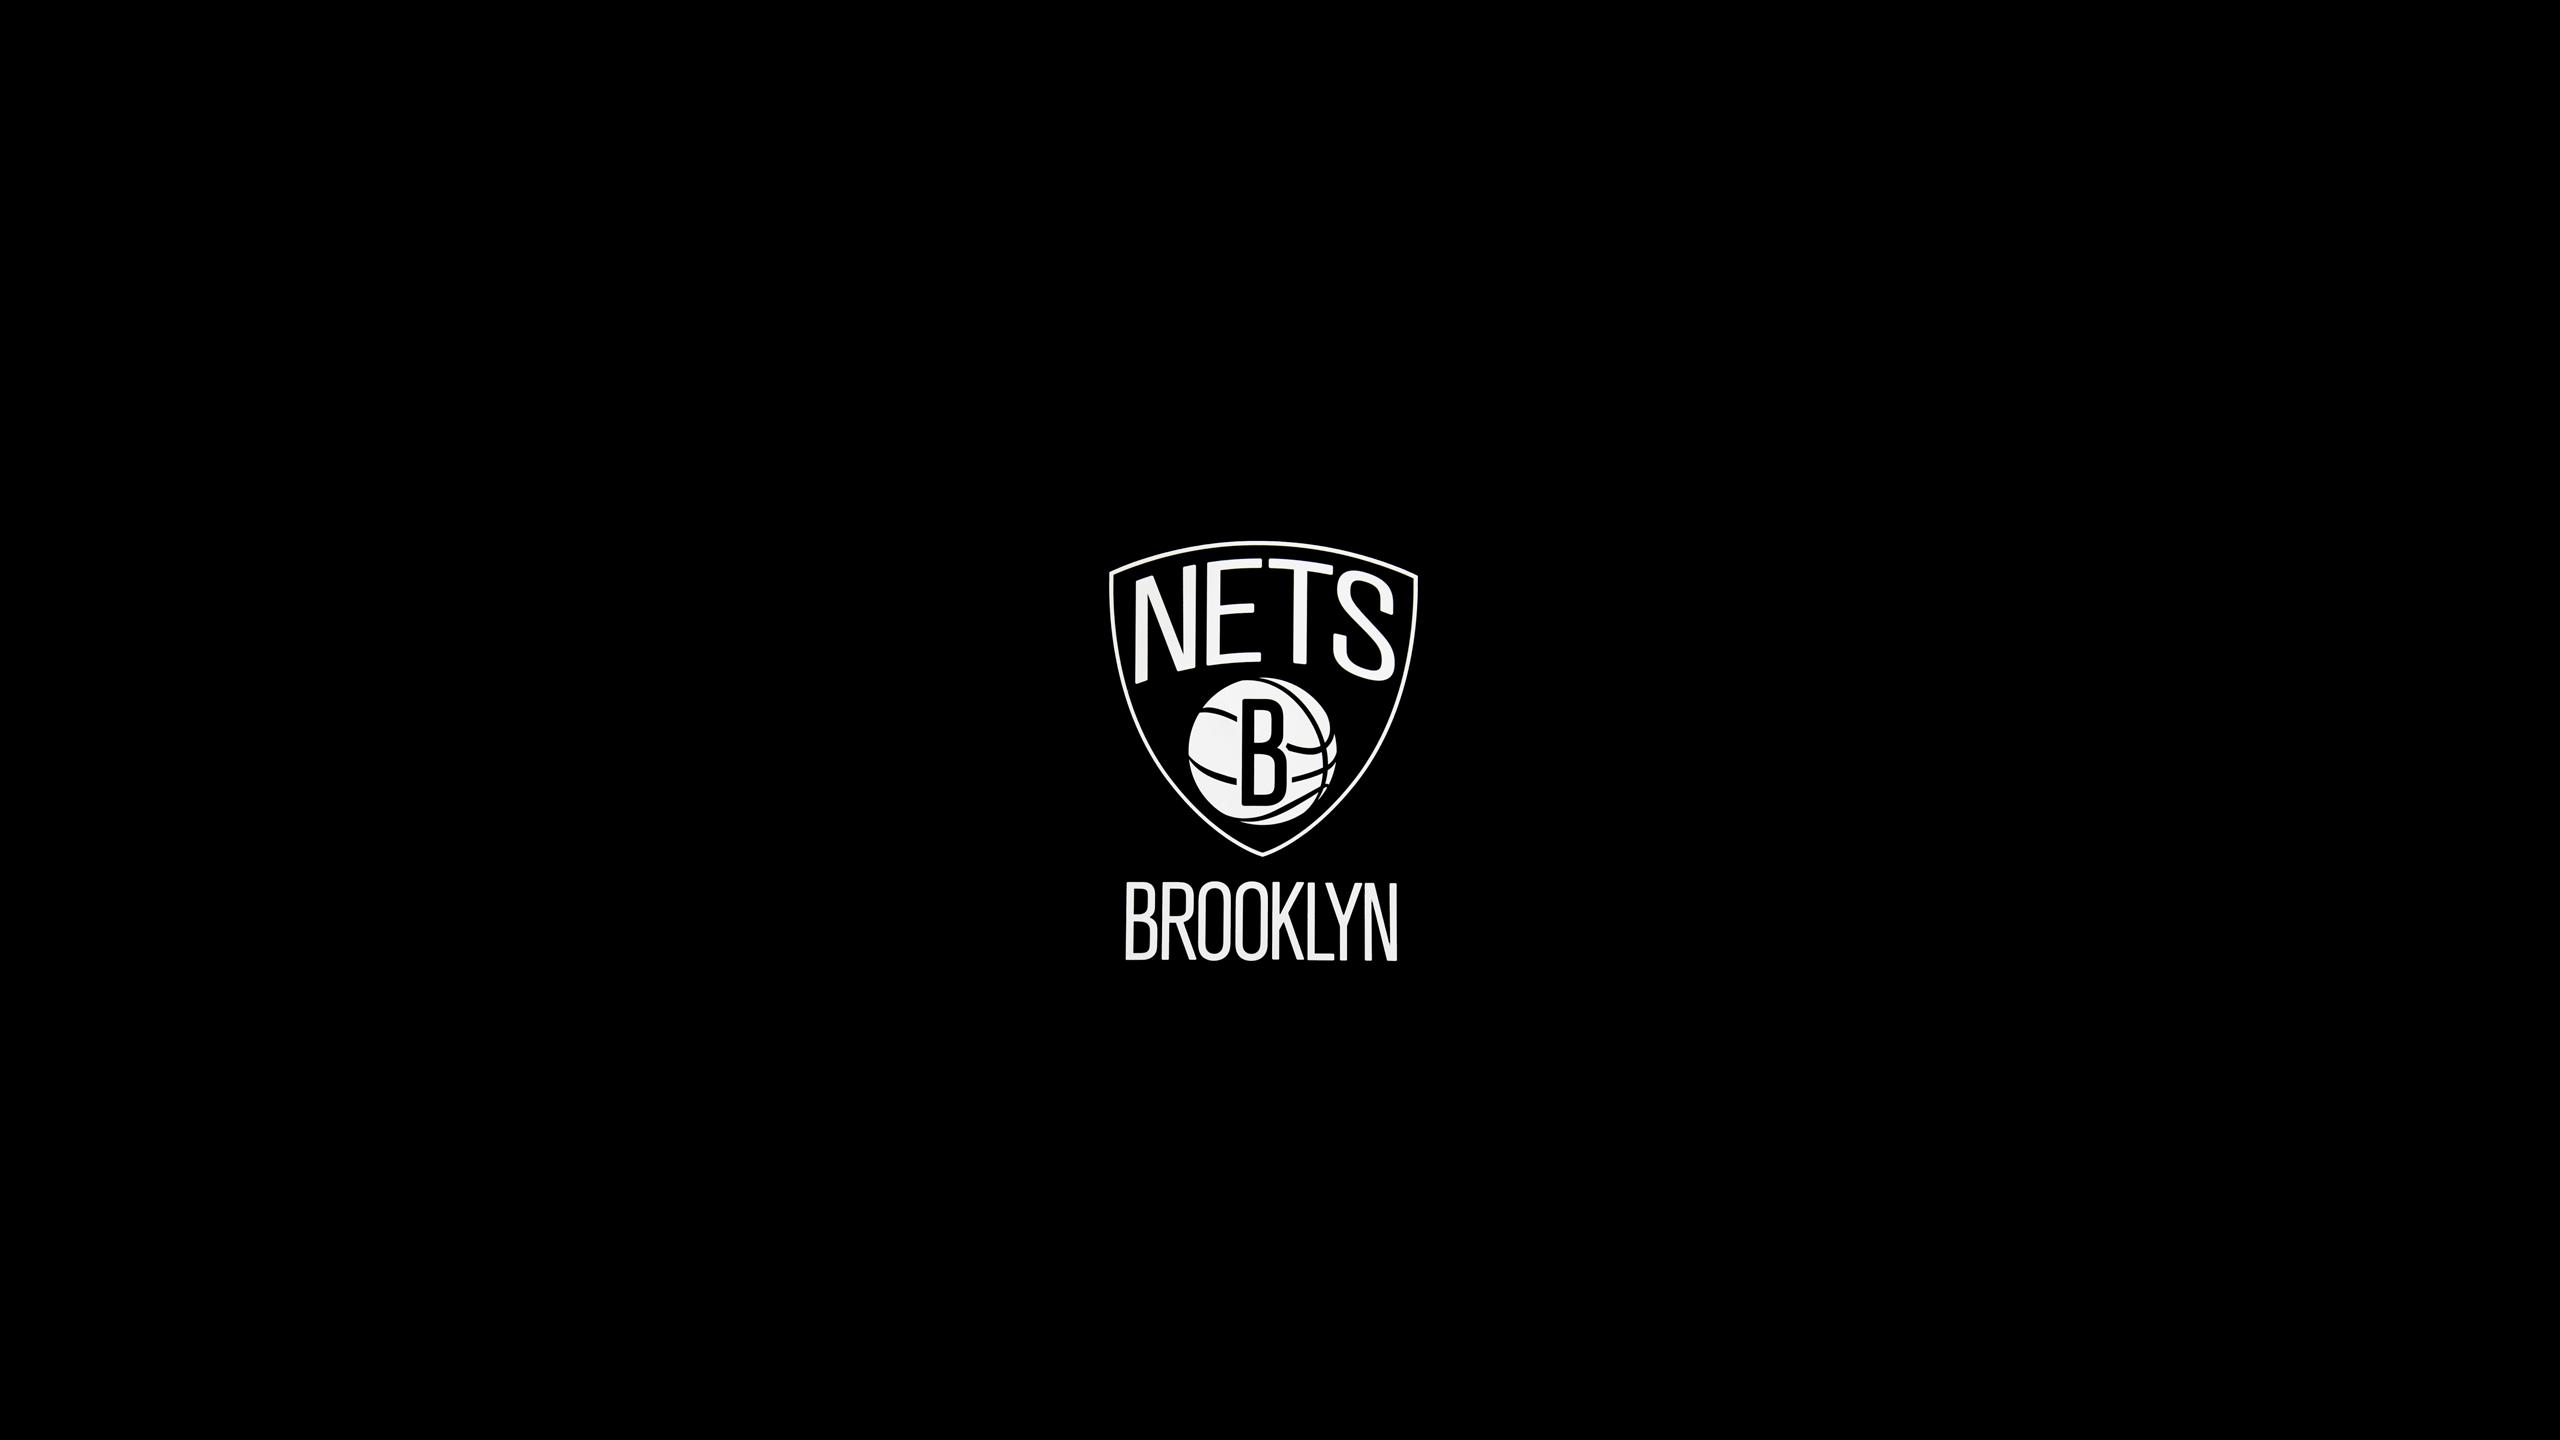 BROOKLYN NETS nba basketball 1 wallpaper 2560x1440 227875 2560x1440